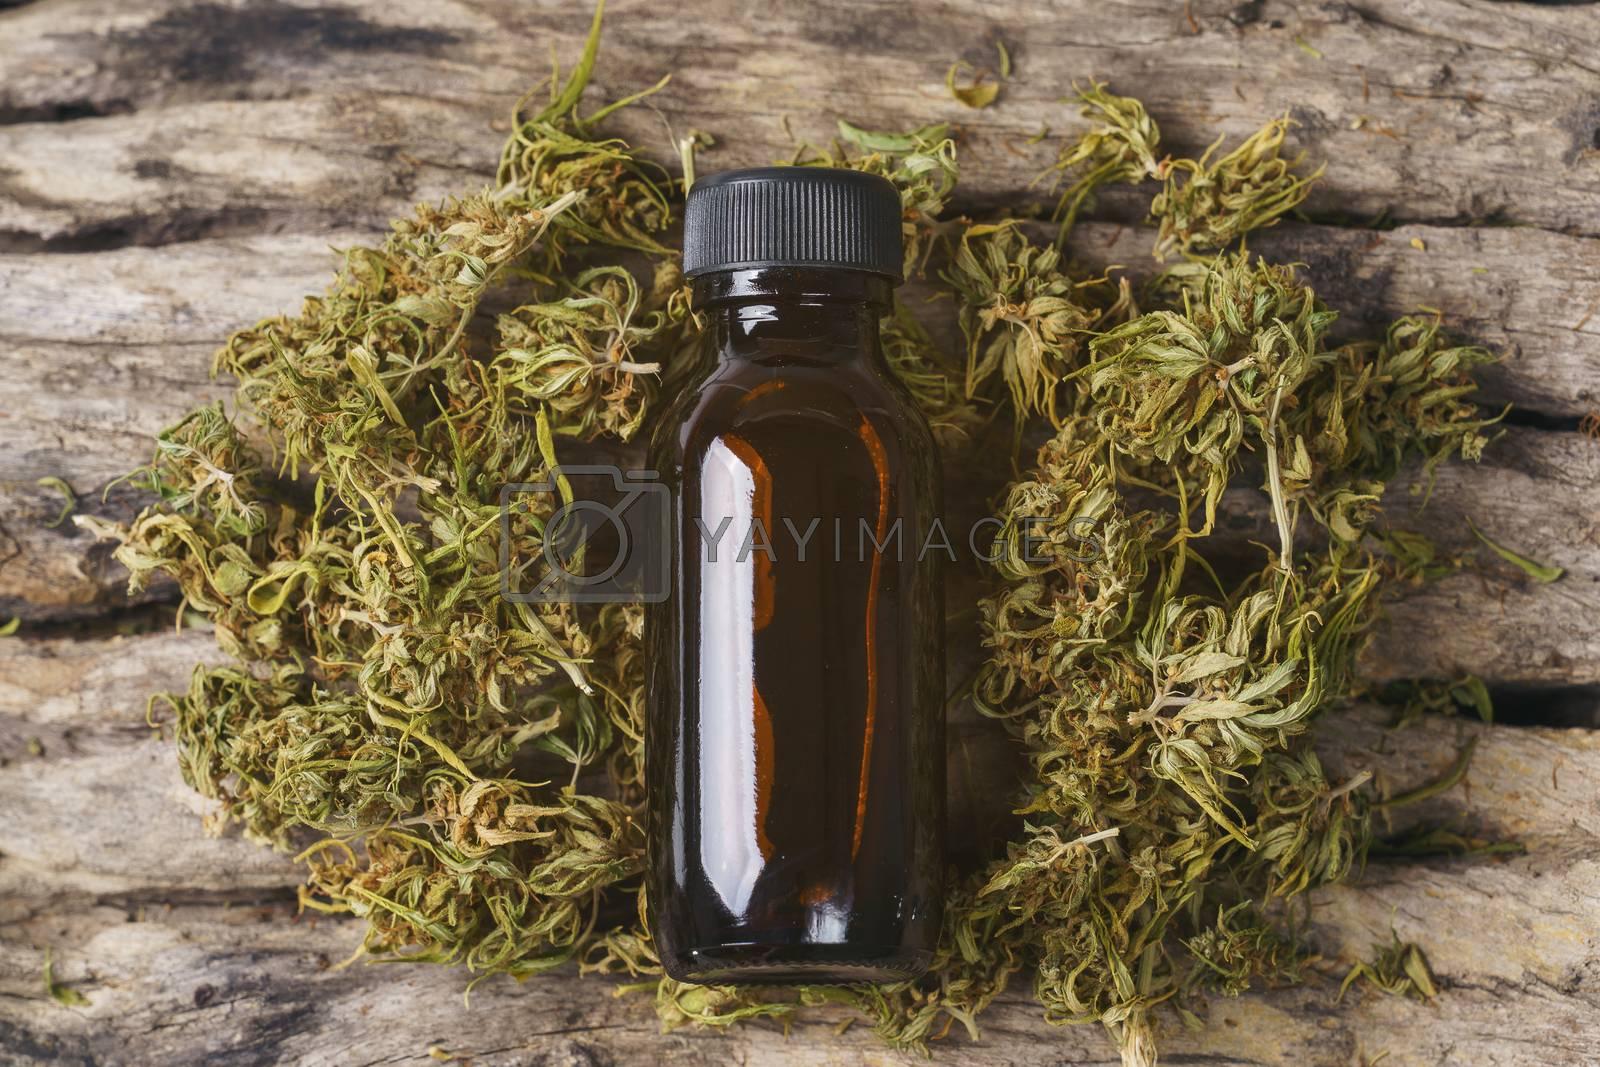 dried cannabis medical marijuana with CBD and THC extract